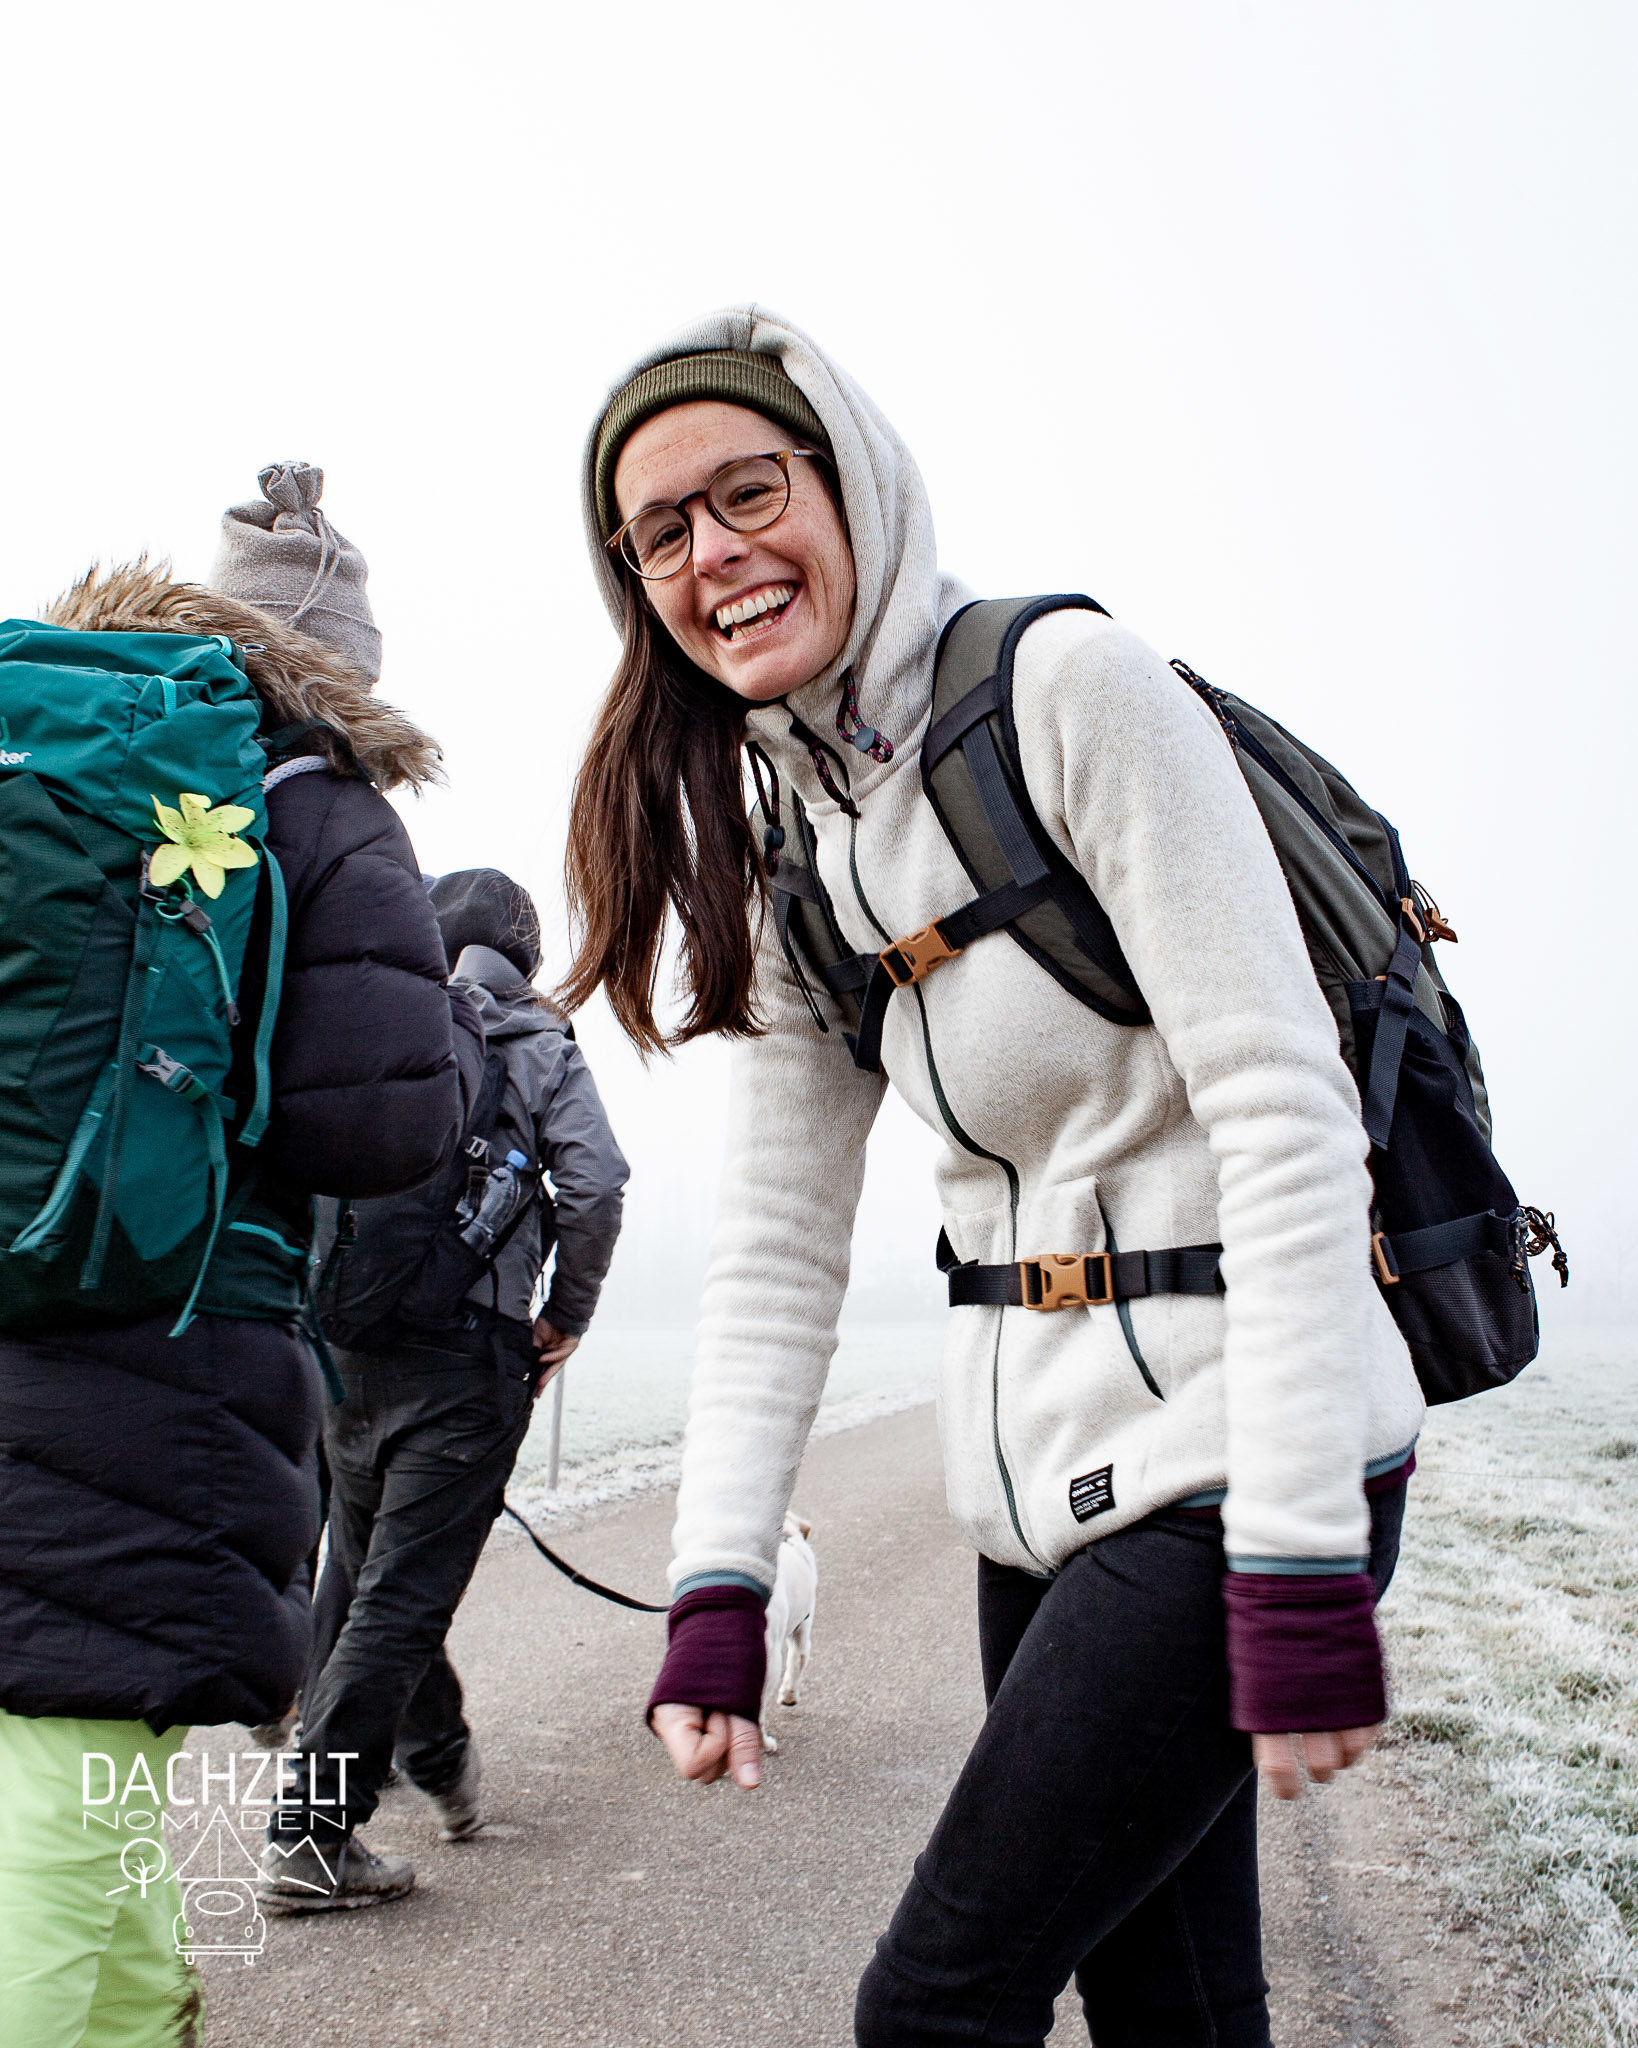 20190103-DACHZELT-SILVESTER-CAMP-Michael-Heinrich-56-Winterwanderung